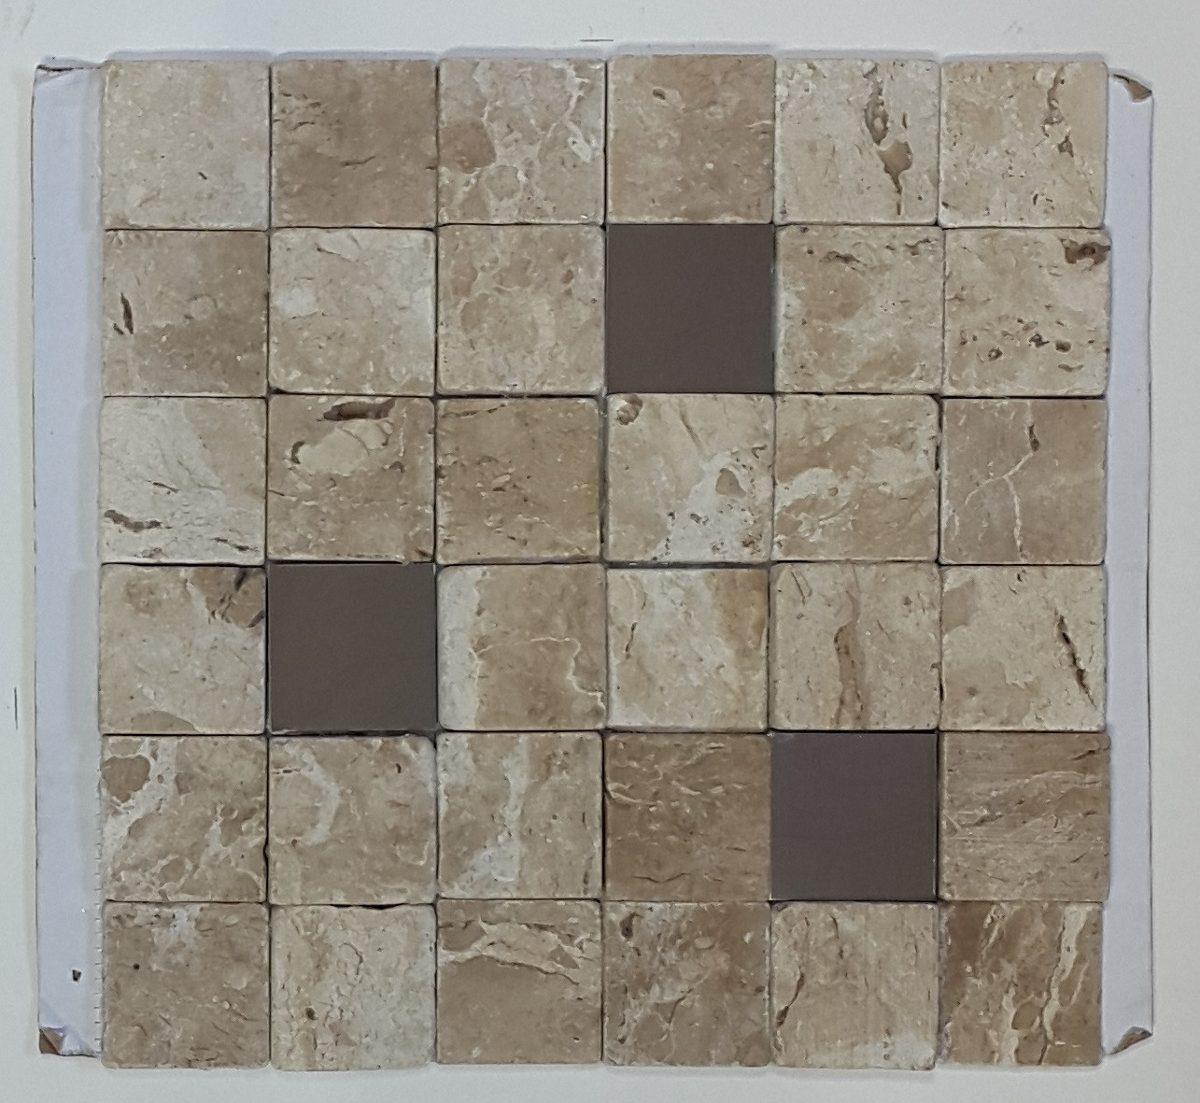 Anticato de m rmore travertino com inox mosaico for Leroy merlin mosaico decorativo